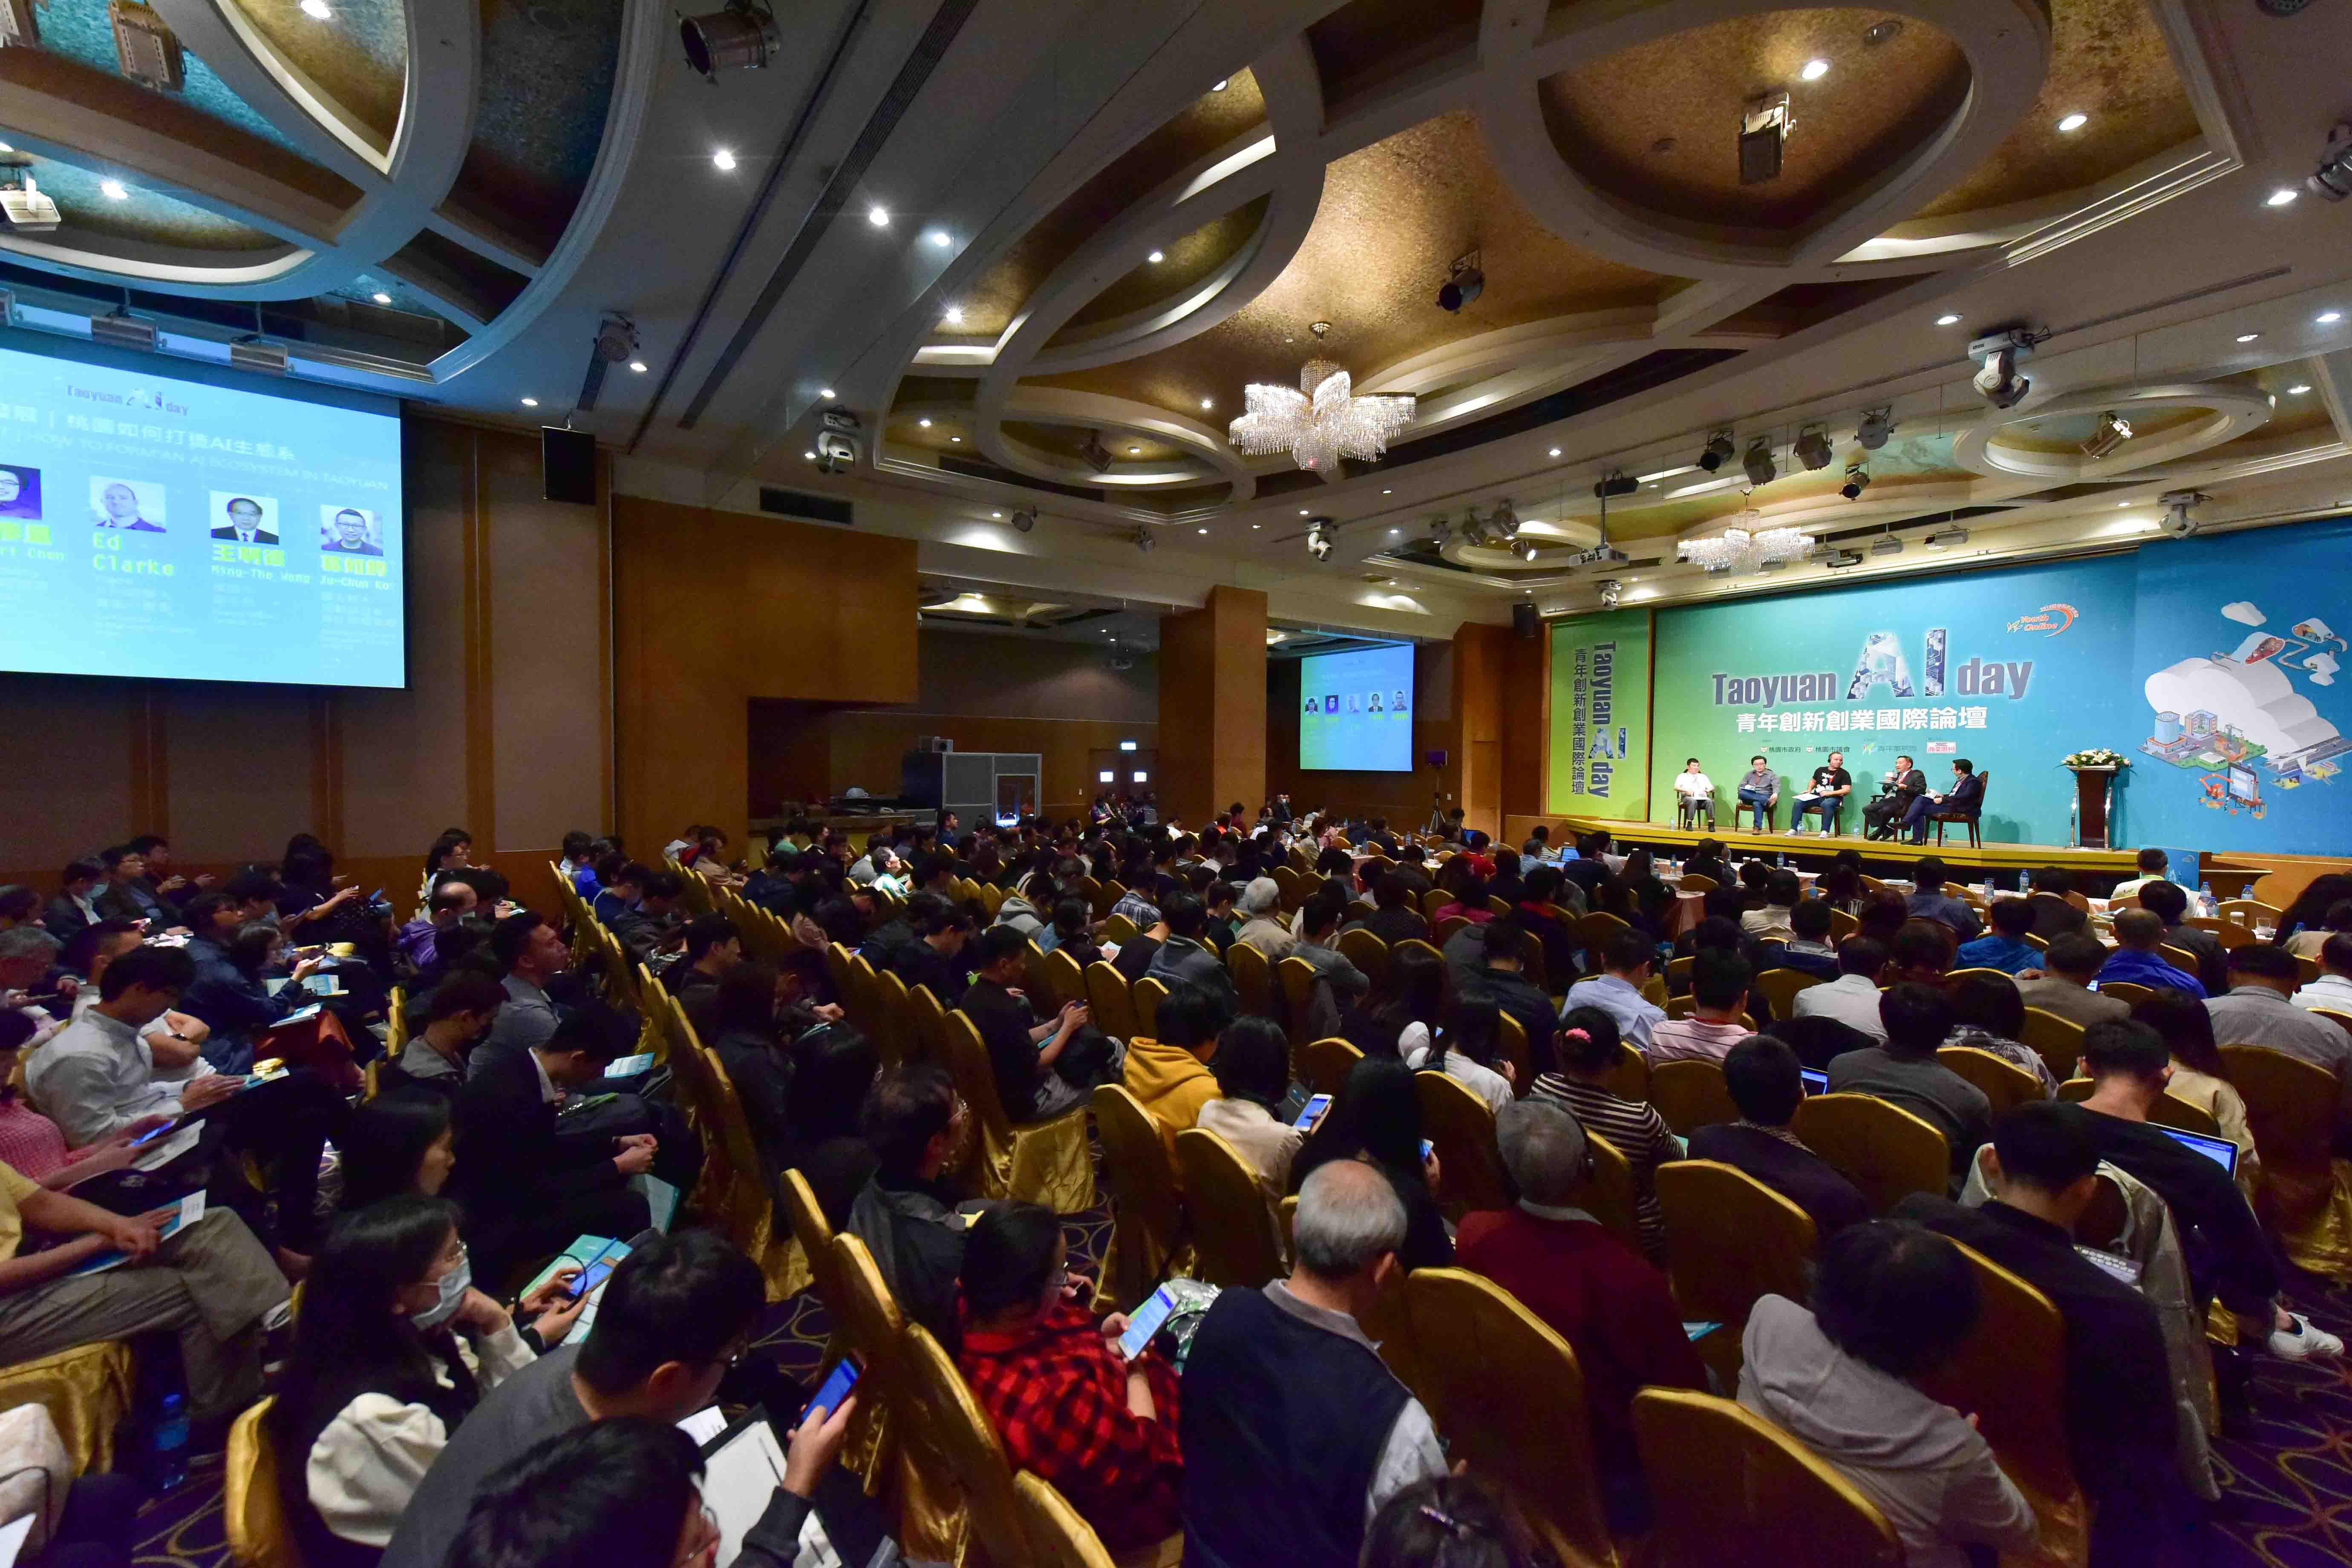 Taoyuan AI day創新創業國際論壇